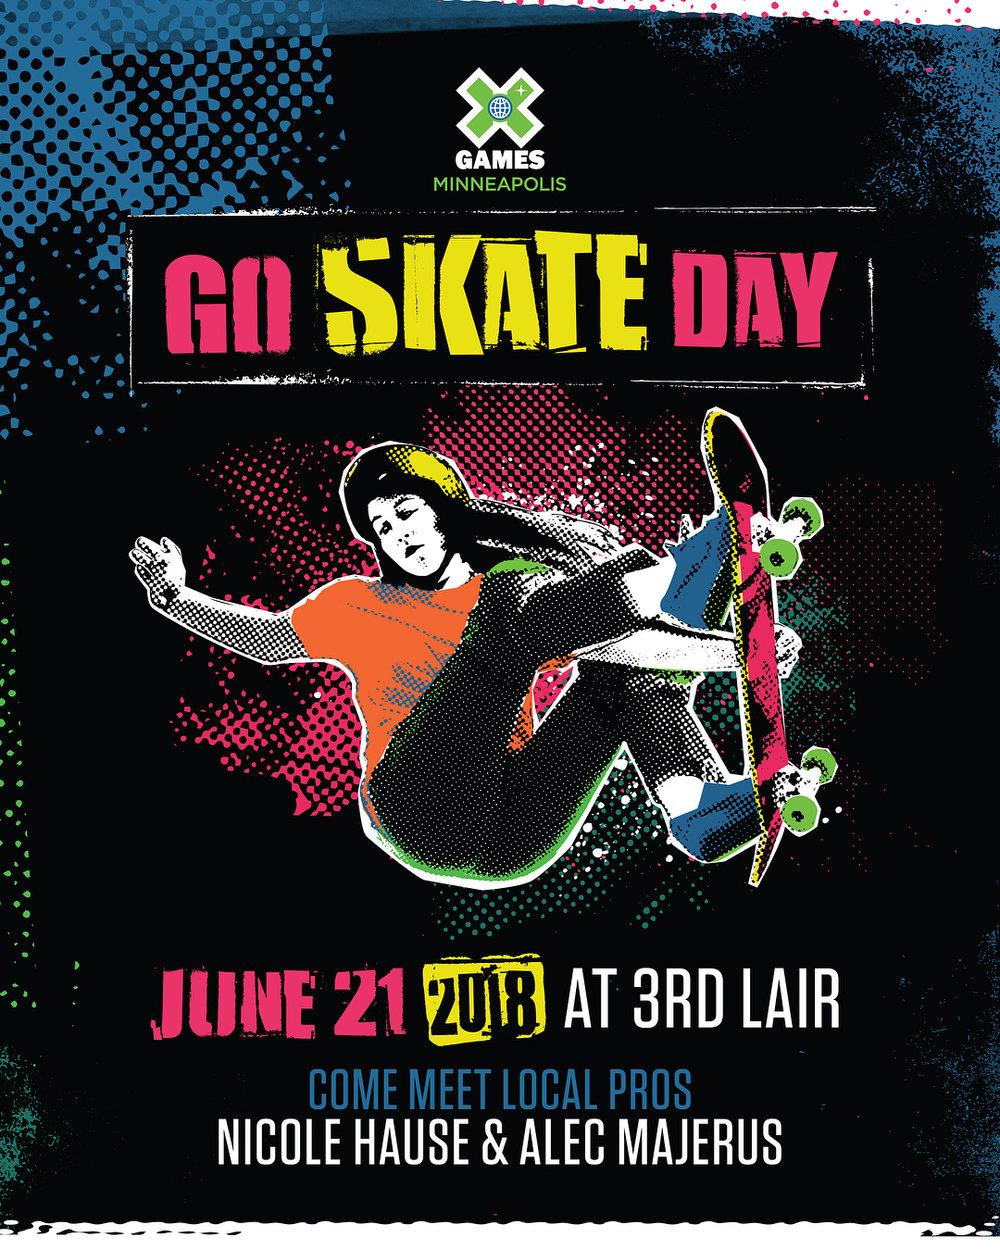 3rdLair-GoSkateDay1.jpg